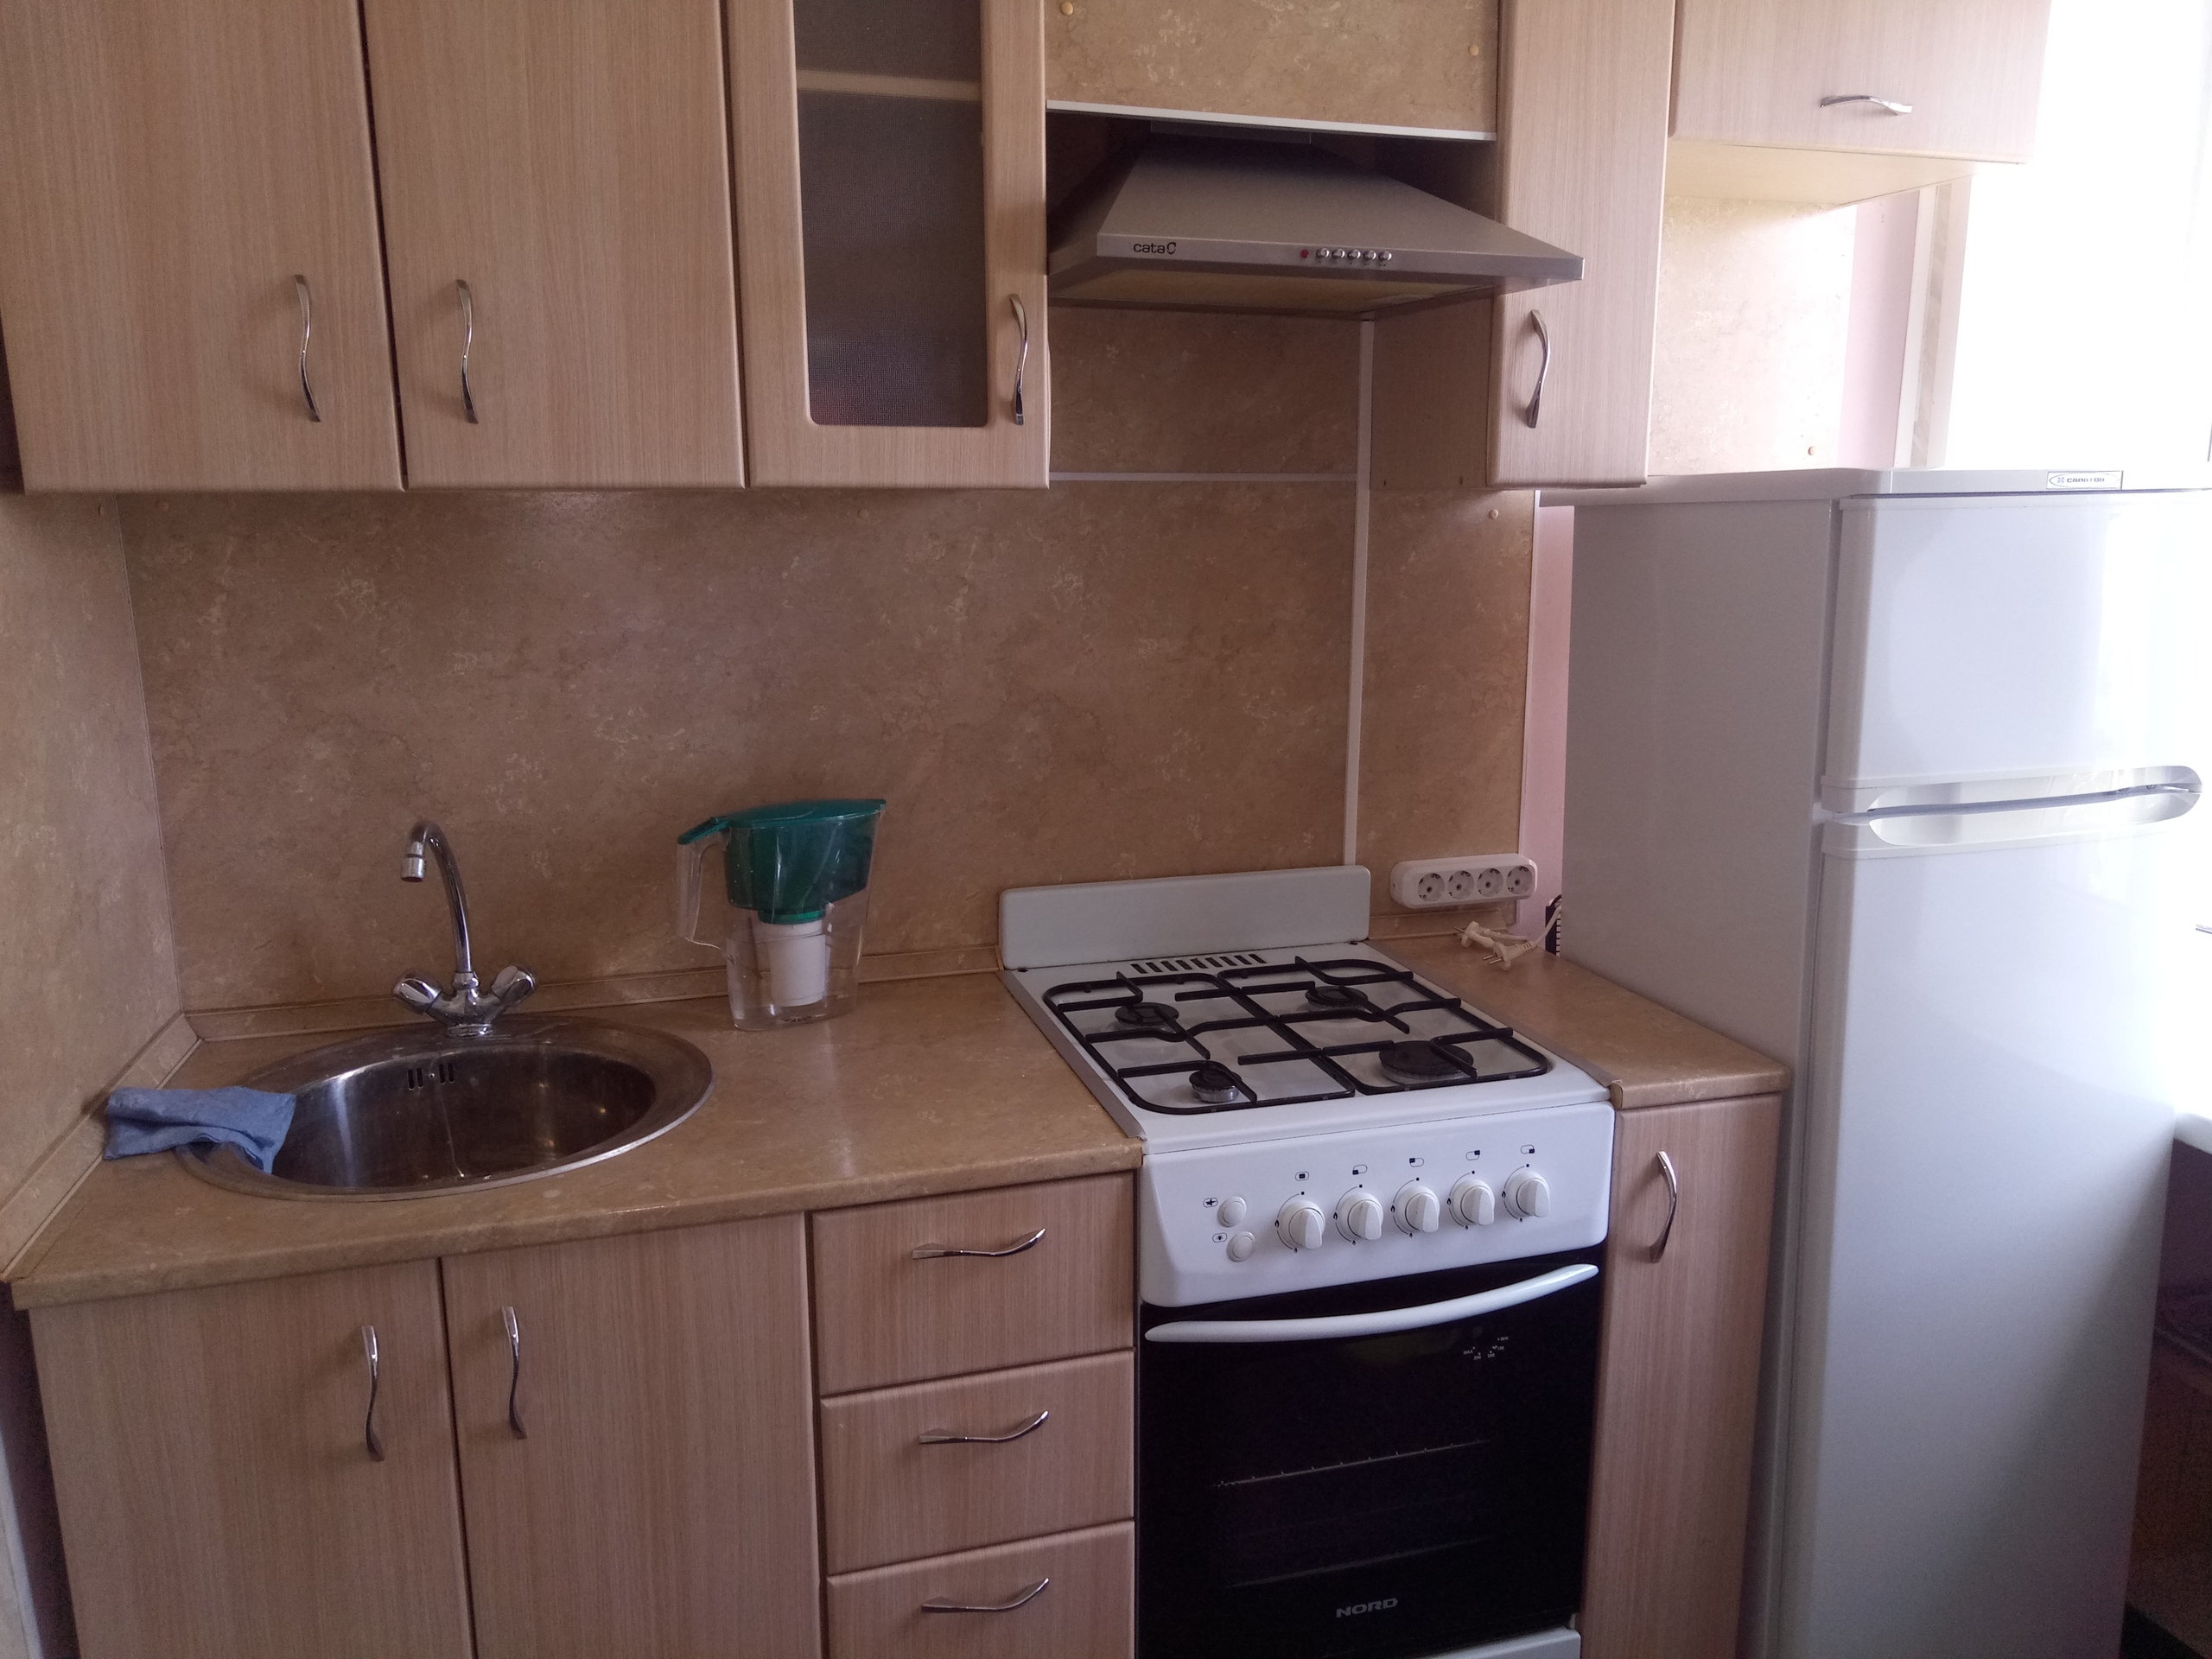 Продам 1-комнатную квартиру в центре города Шатура пр